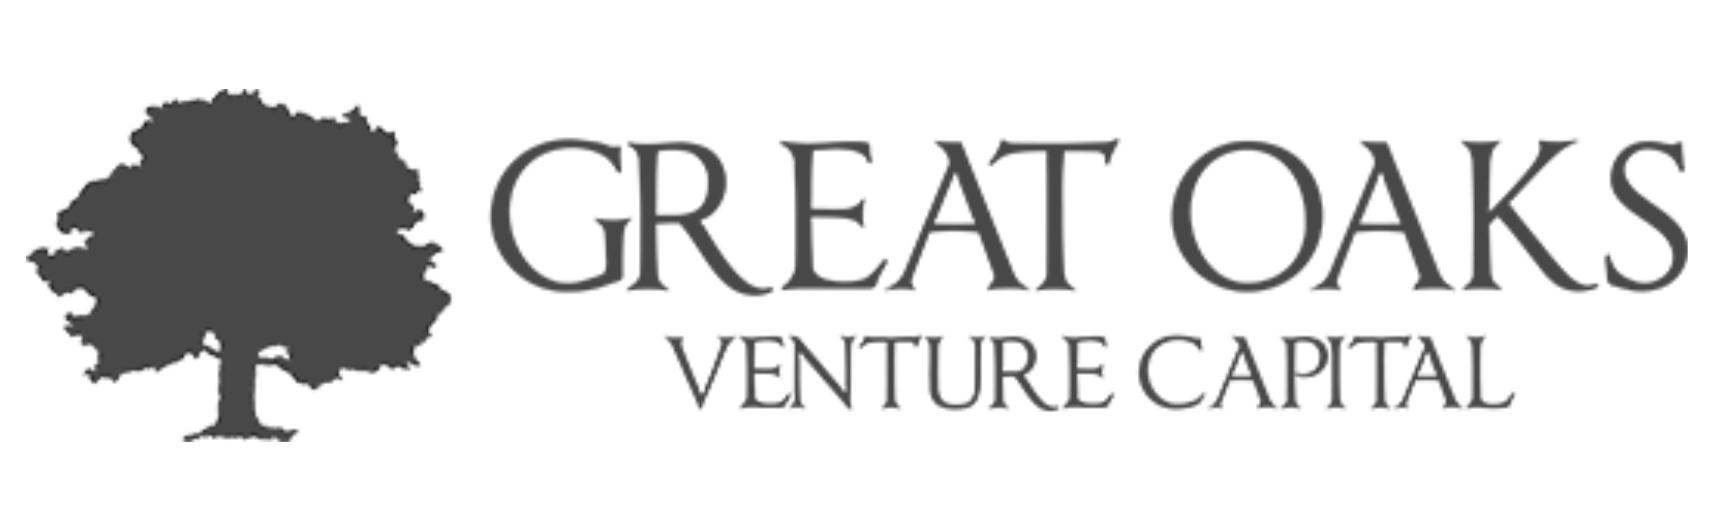 Great Oaks Venture Capital